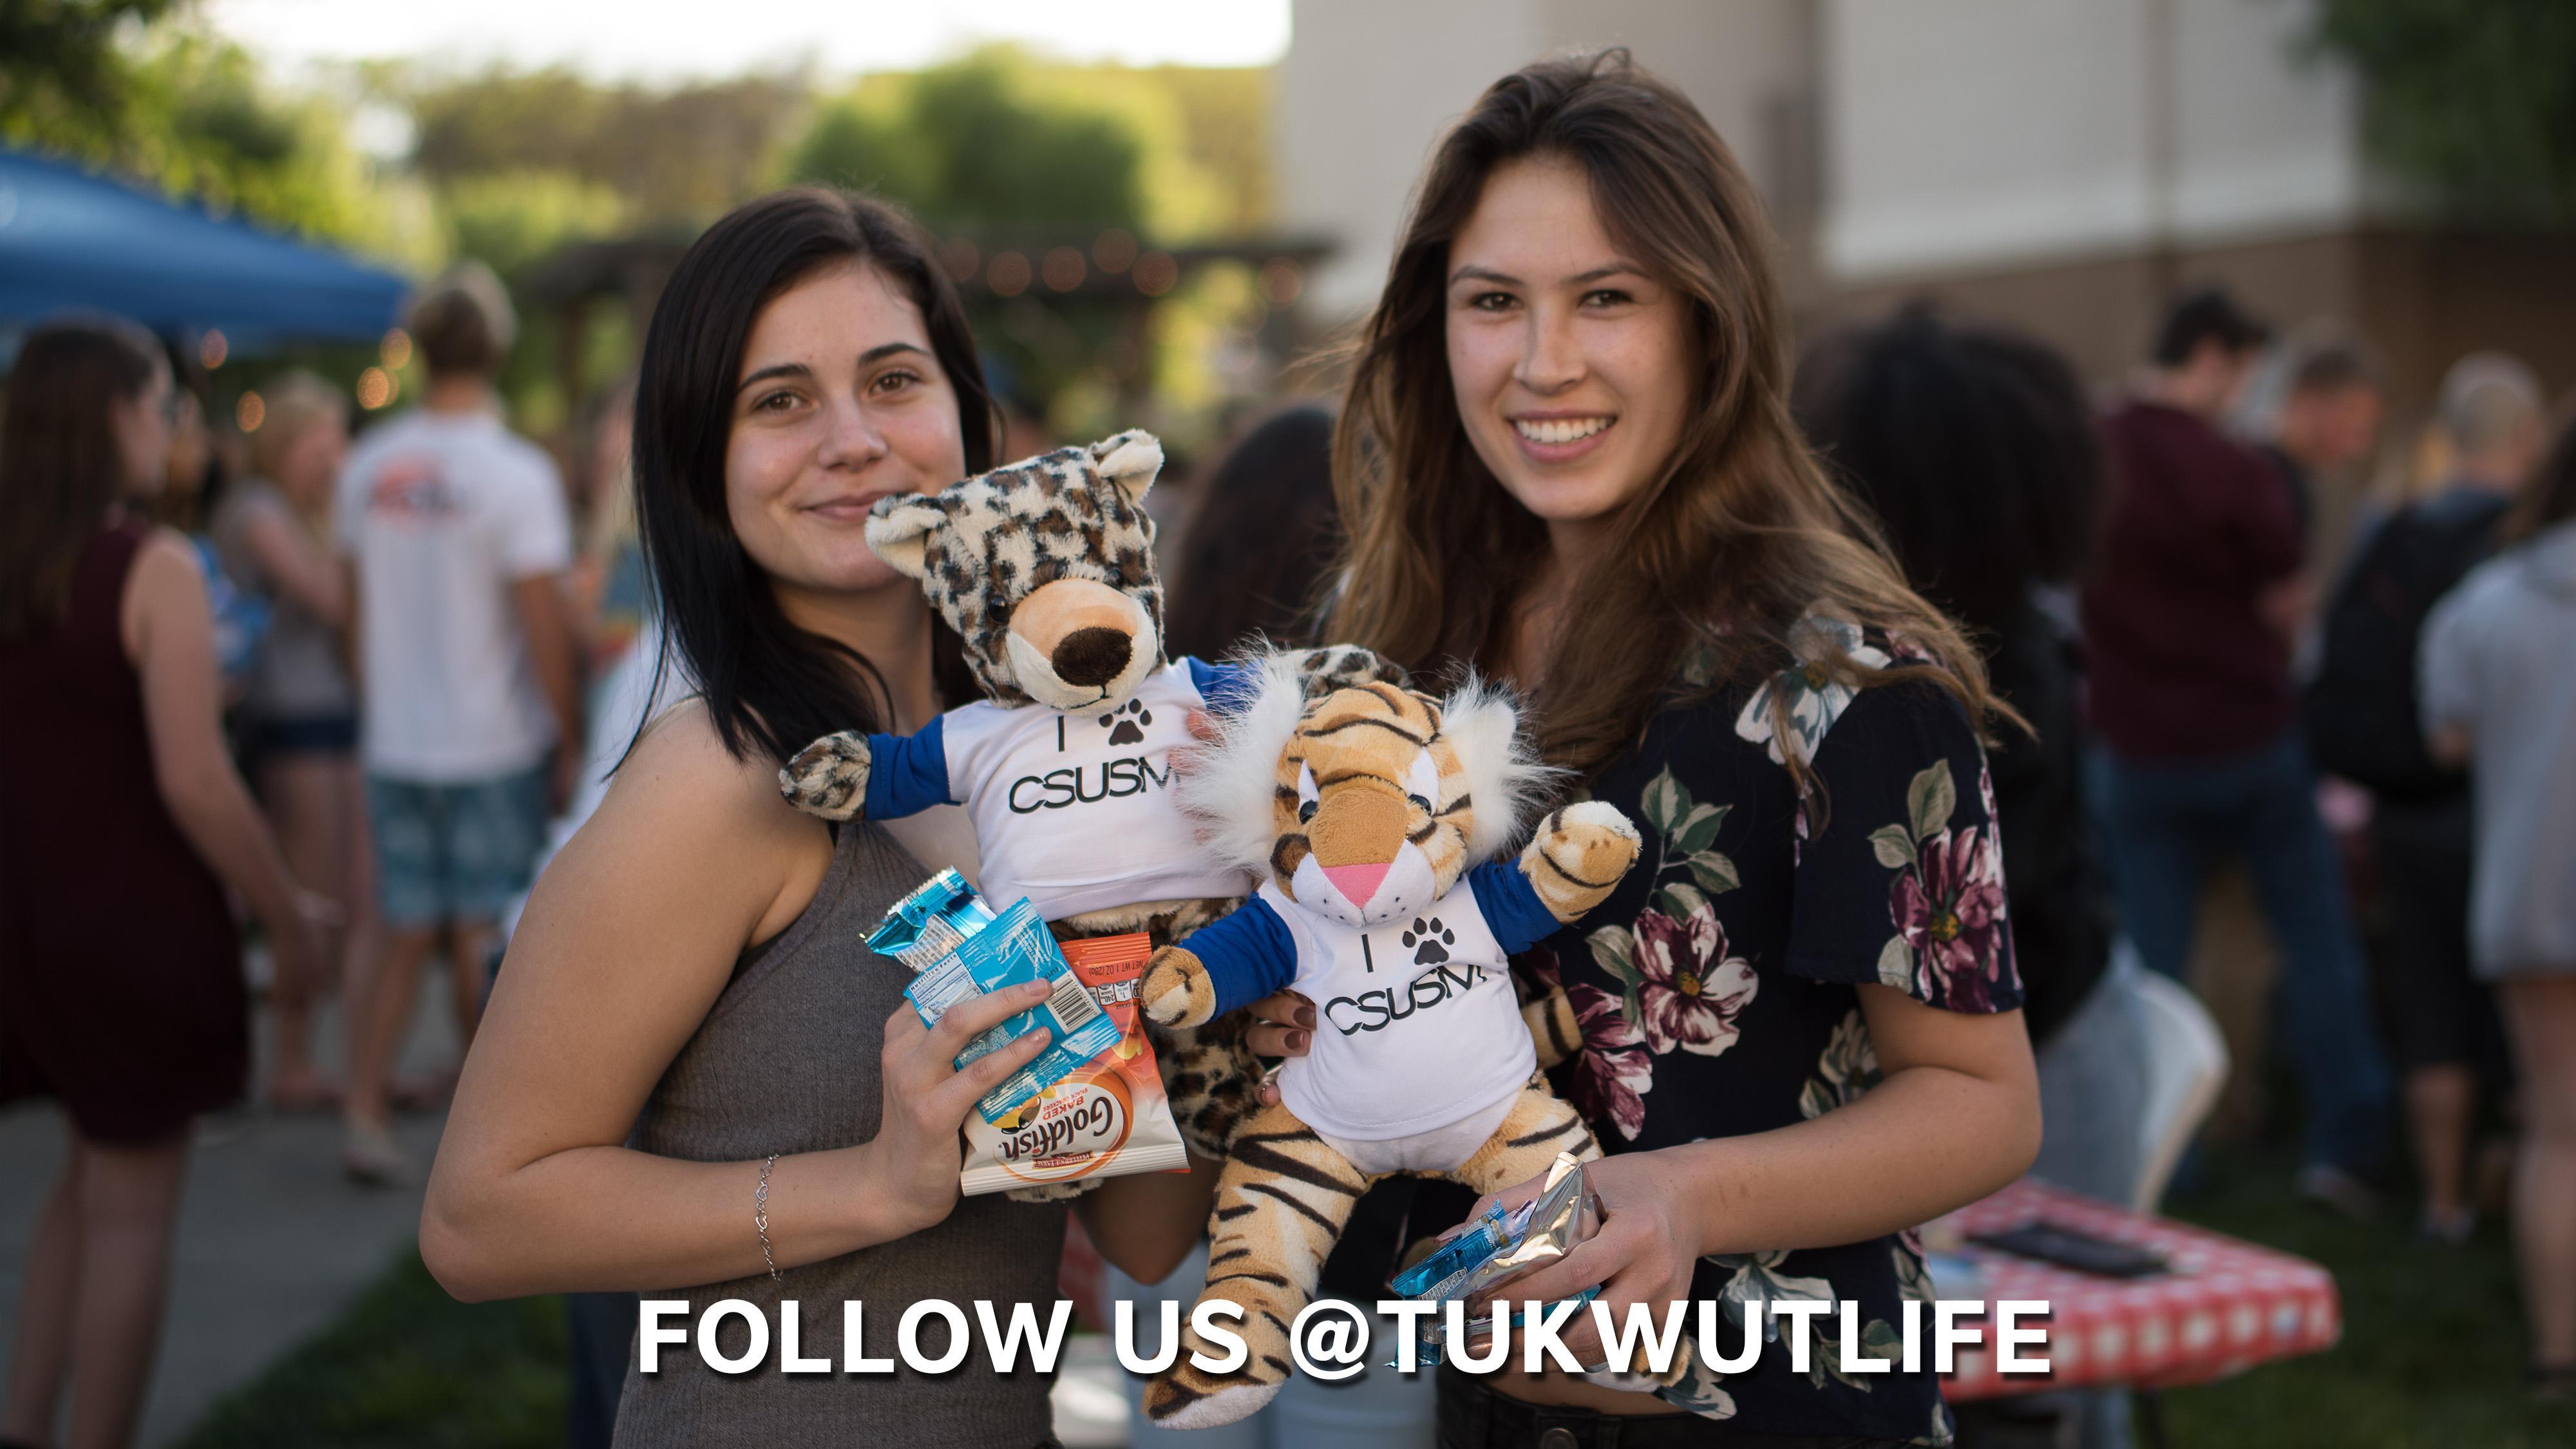 Follow Tukwut Life